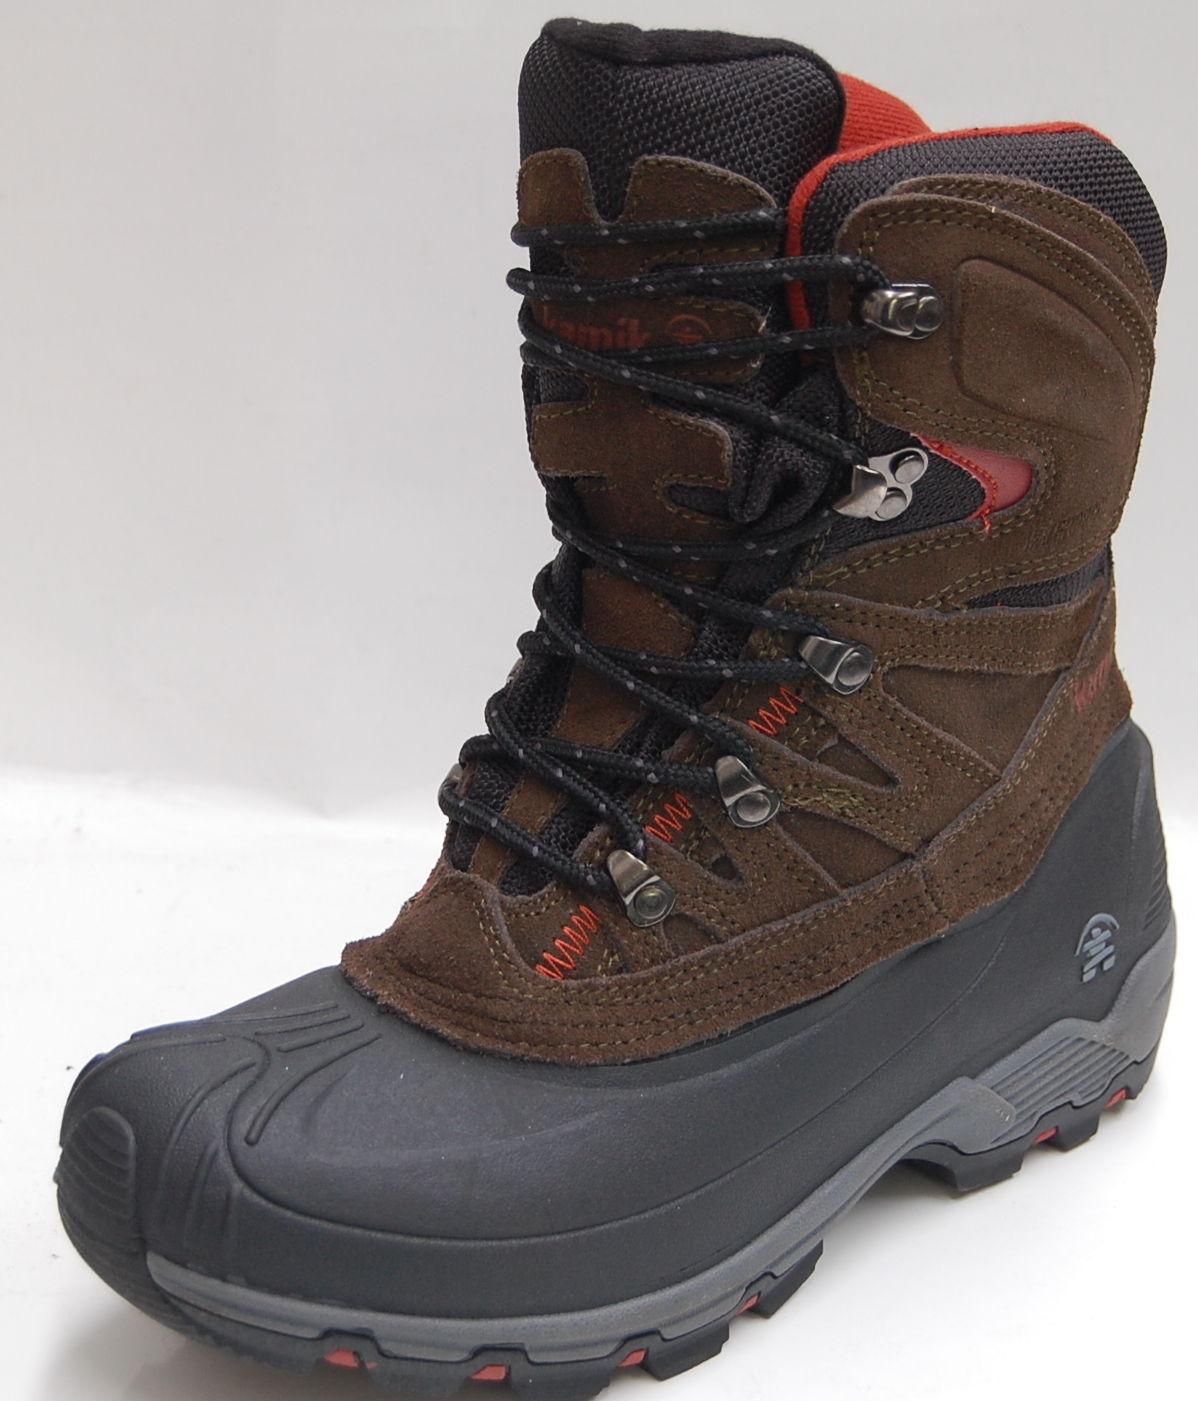 KAMIK Nordicpass olive Canadian Boots -50°C waterproof Gr. 12 / 46 / 28cm